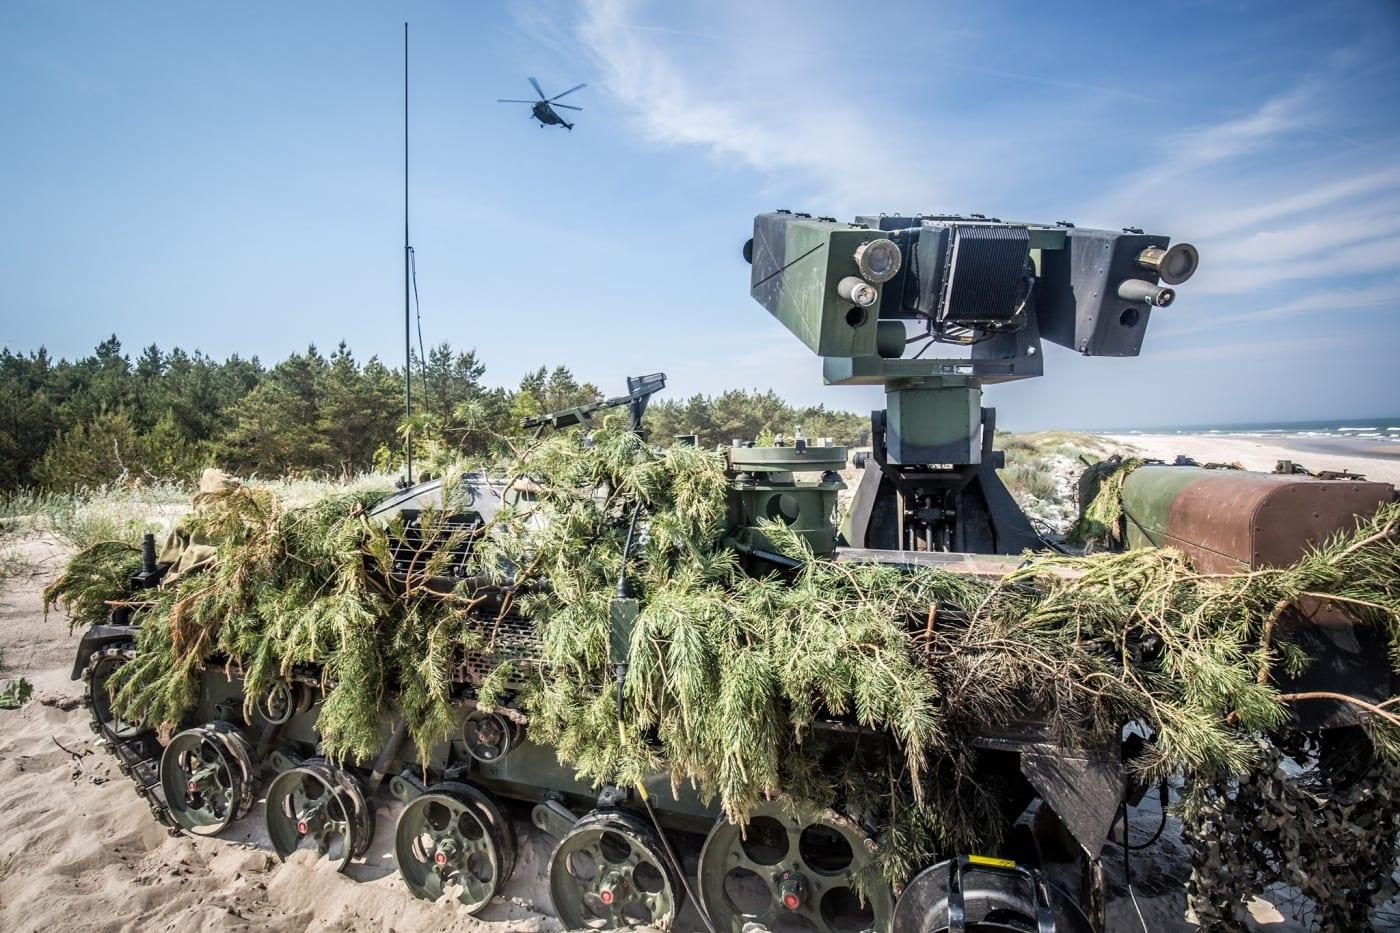 Foto: Bundeswehr Christian Timmig